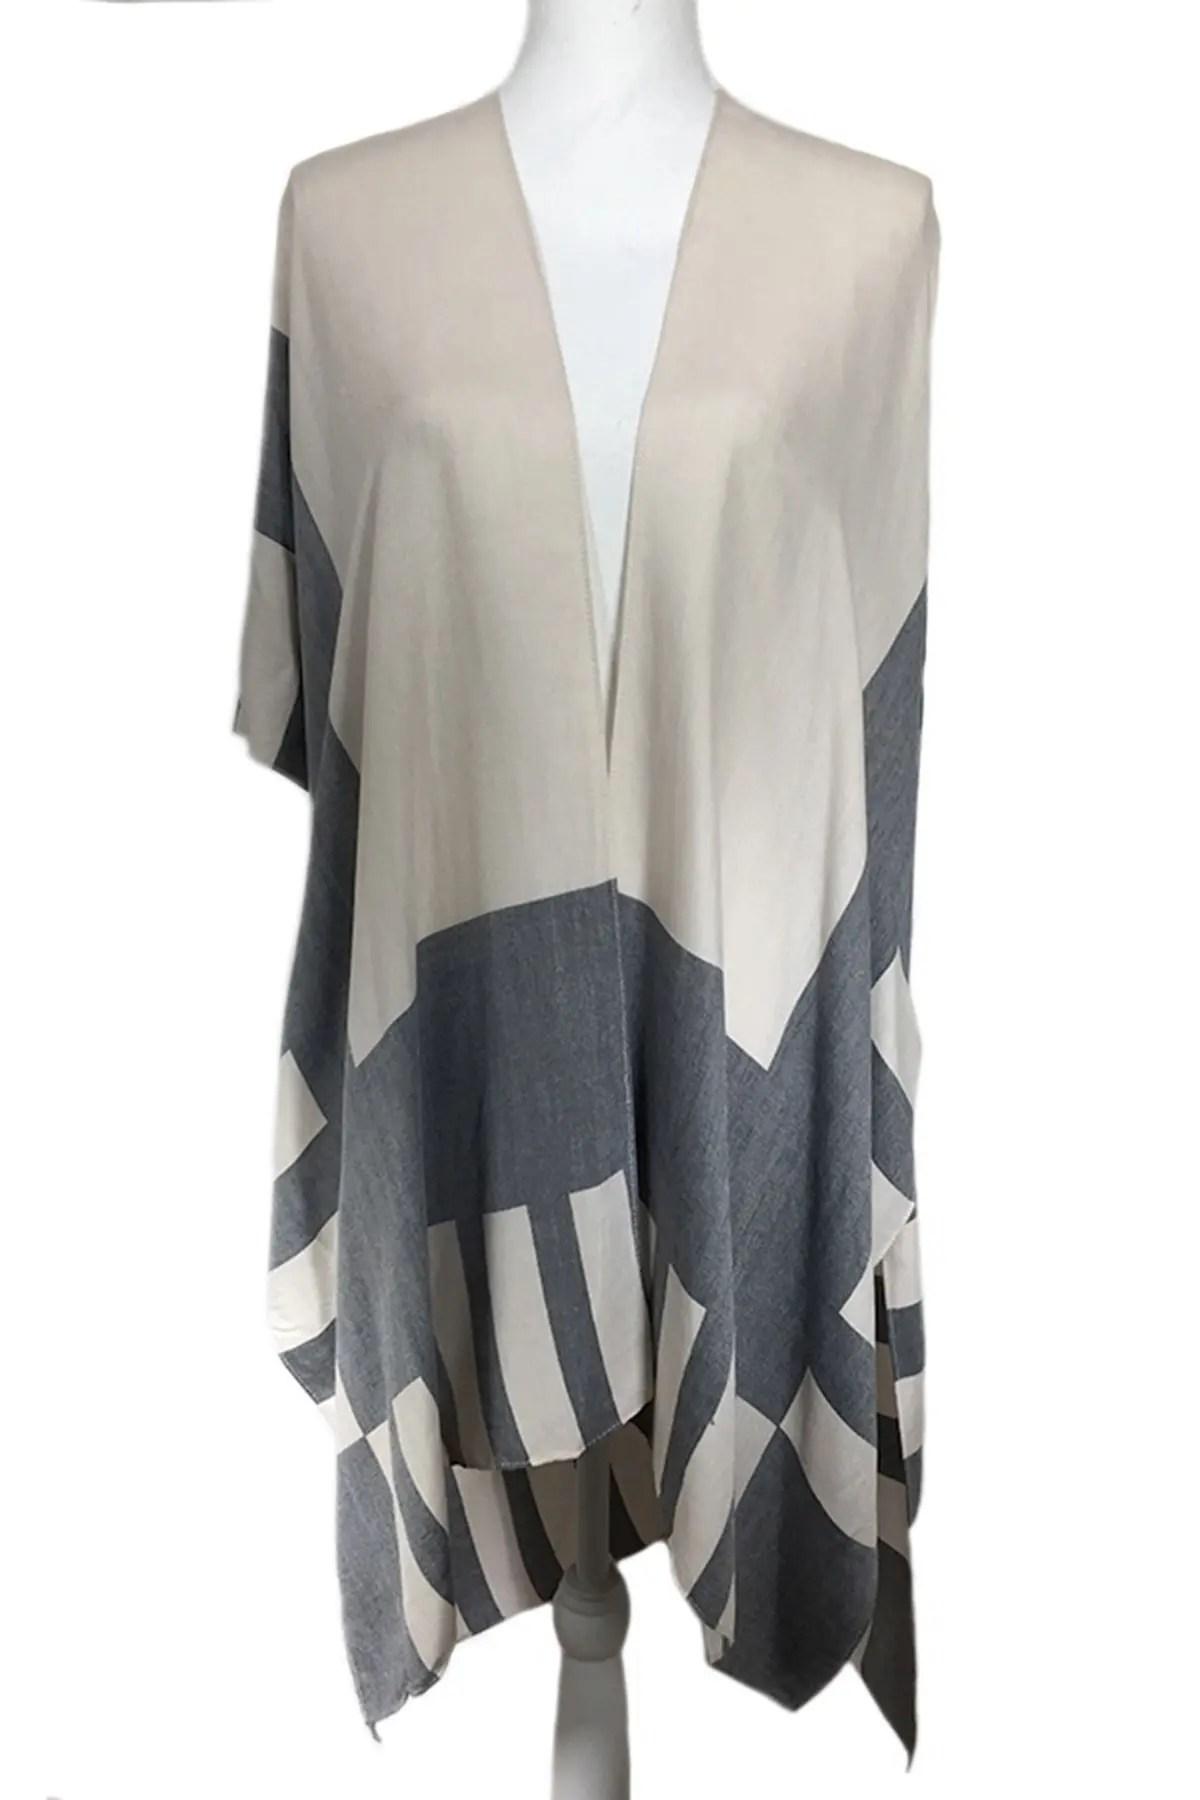 modena lightweight stripes solid mix kimono nordstrom rack